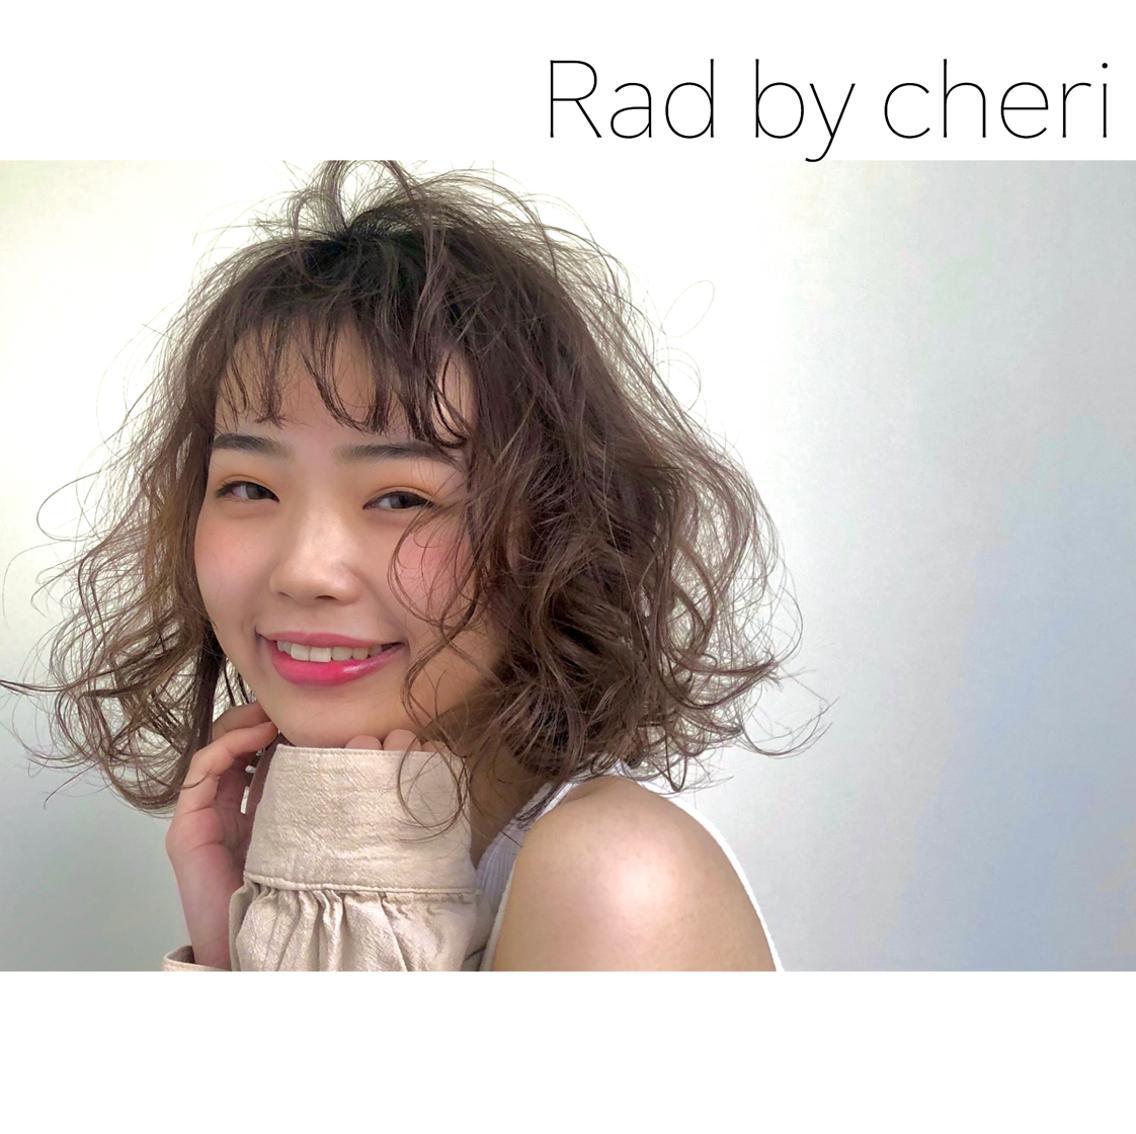 Radbycheri所属・福村優の掲載